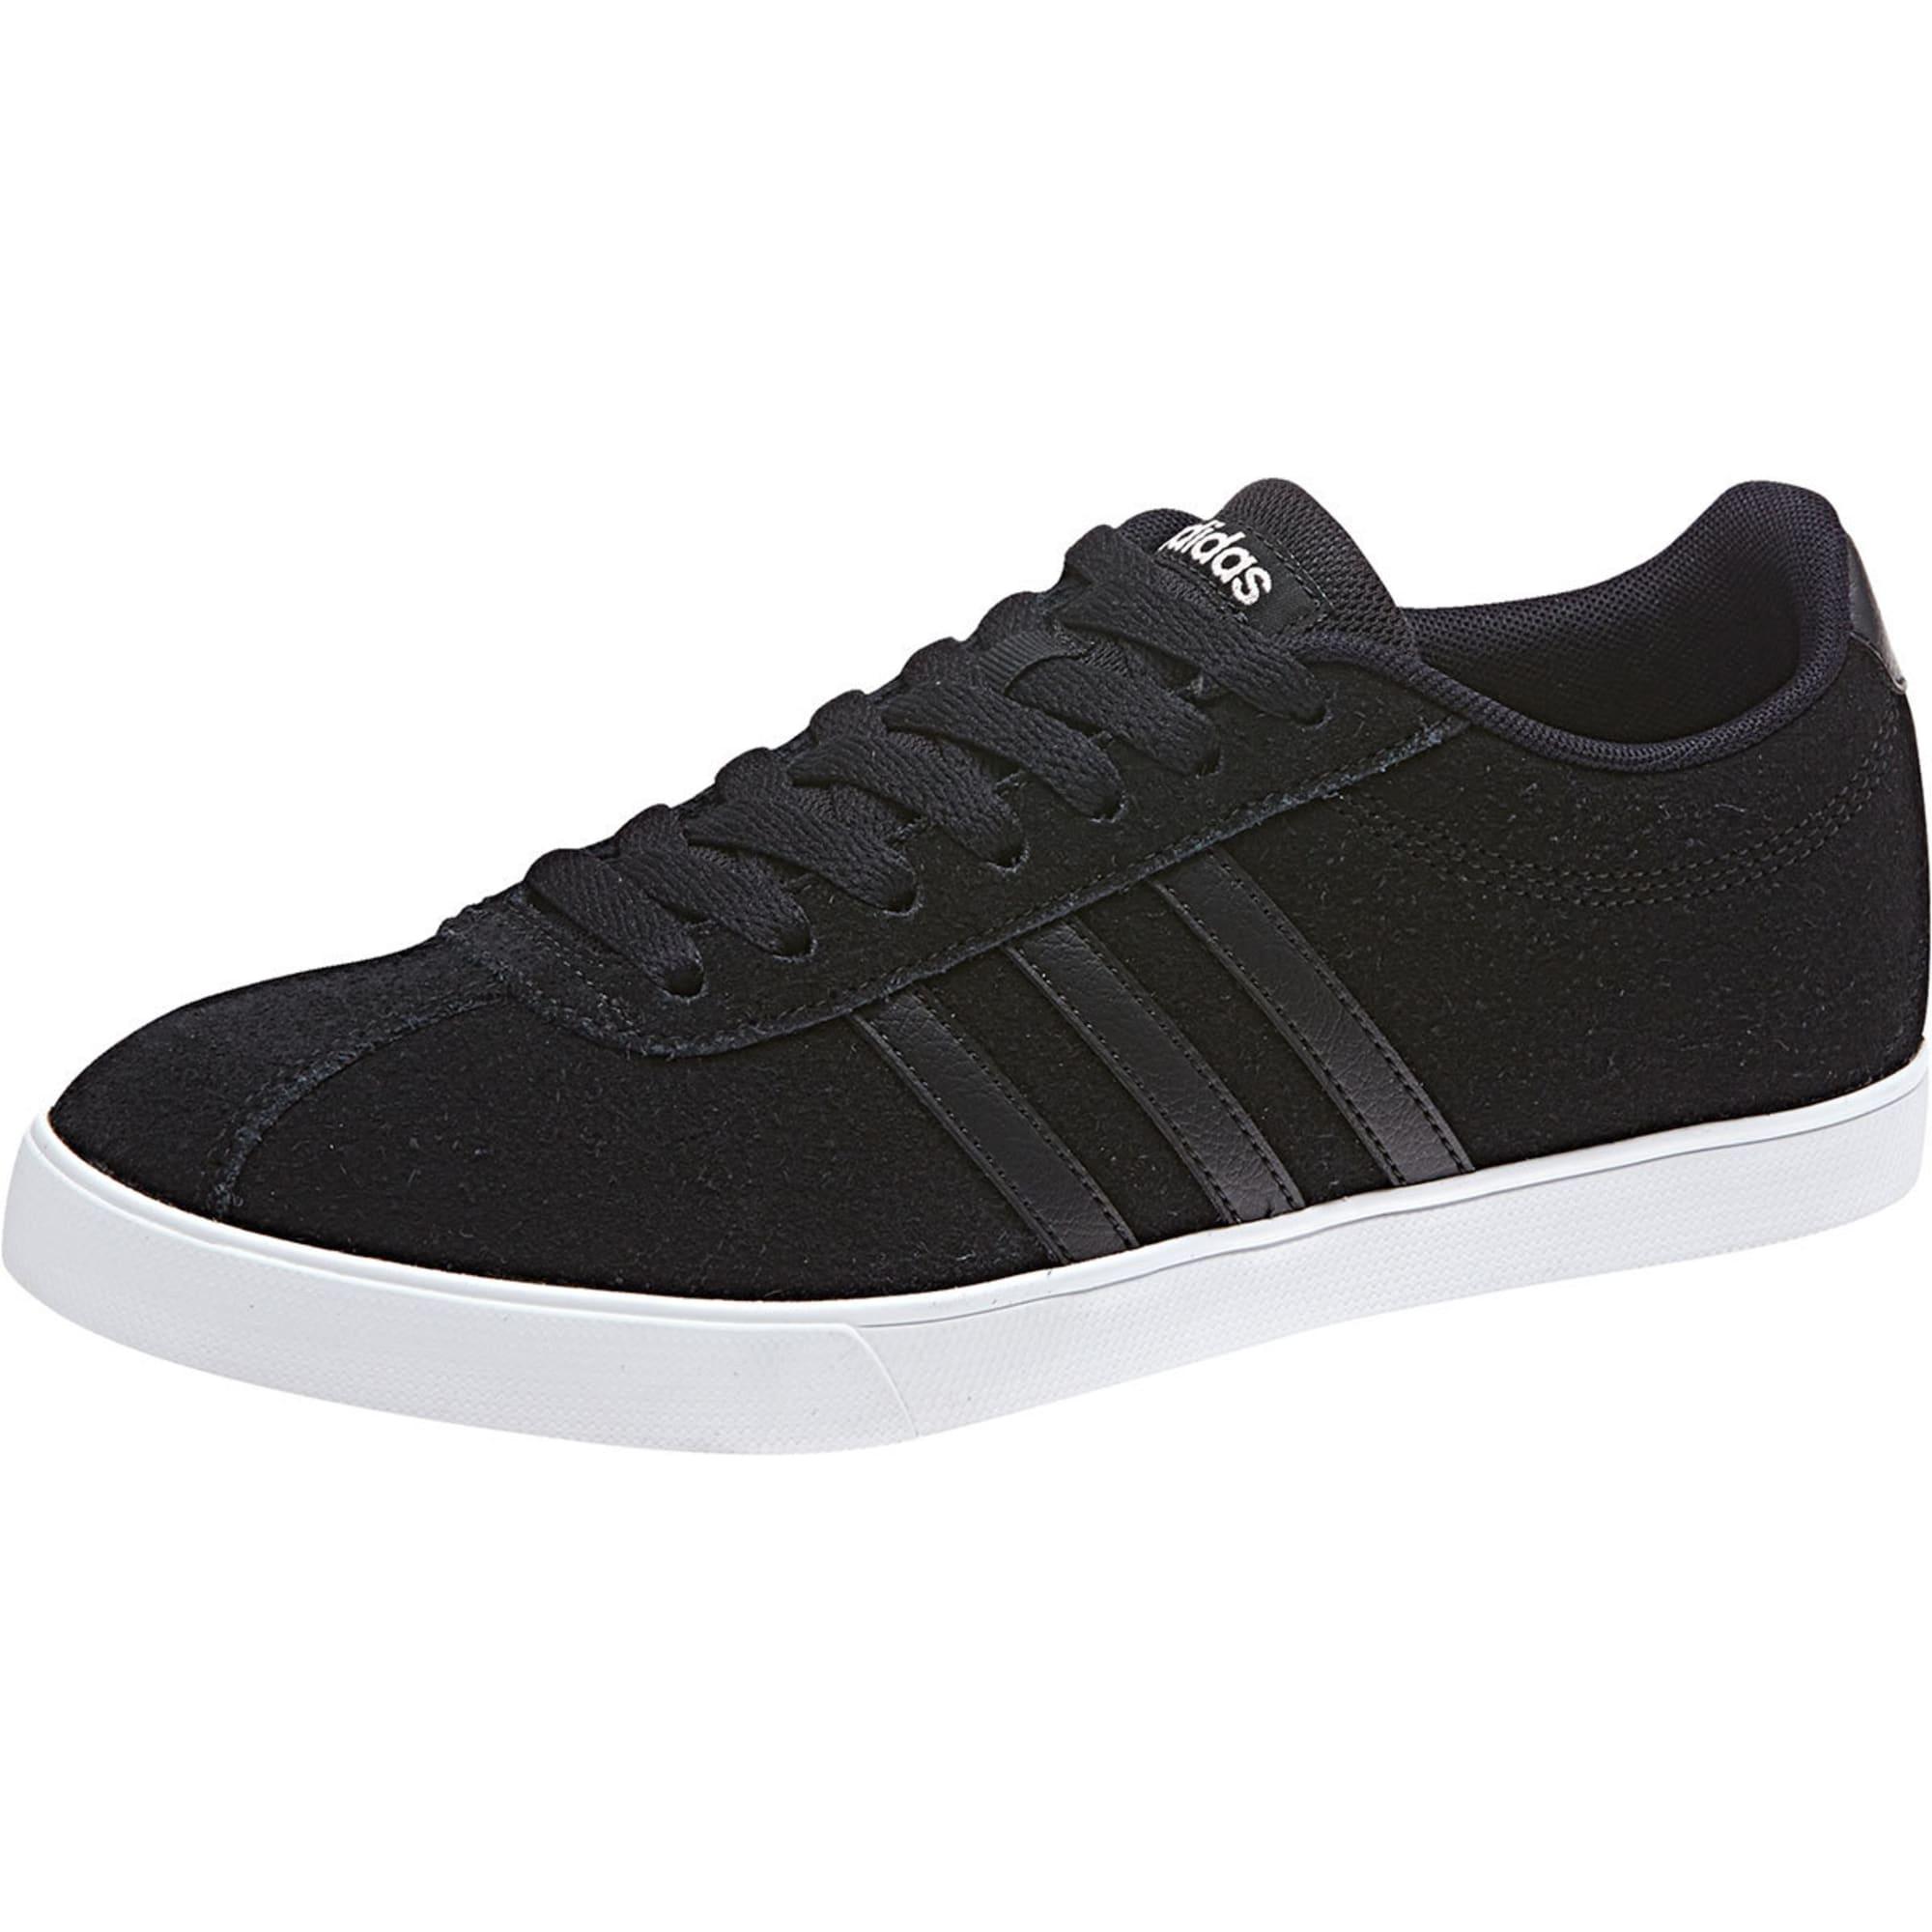 ADIDAS Women's Neo Courtset Sneakers, Black/Metallic